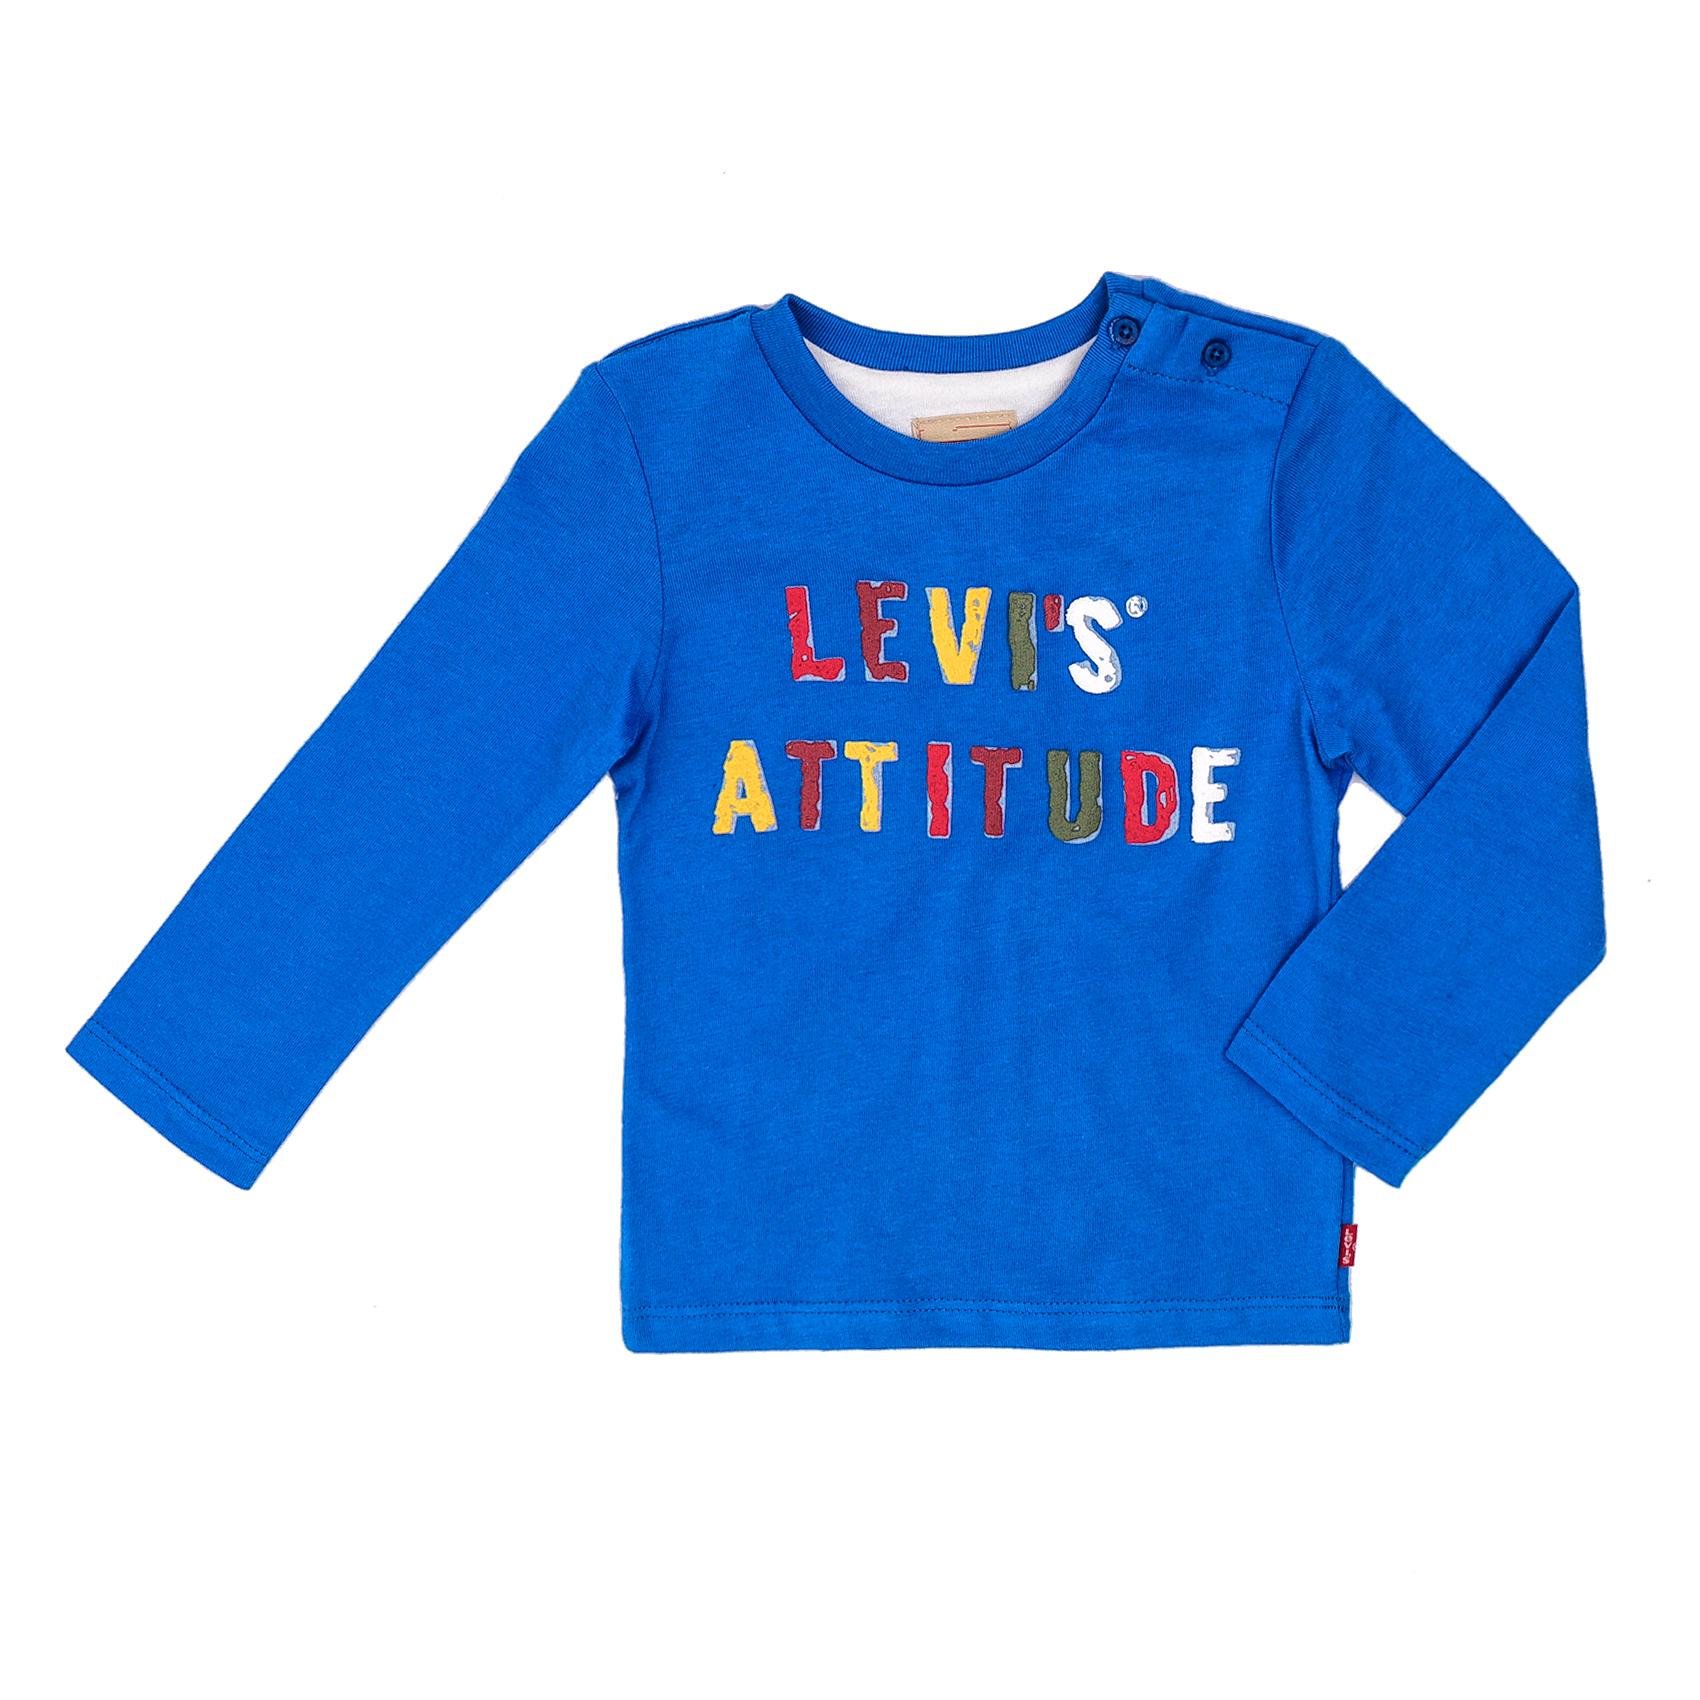 14eb50f10cd Ρούχα για Αγόρια, Μπλούζες για Αγόρια, Μακρυμάνικο